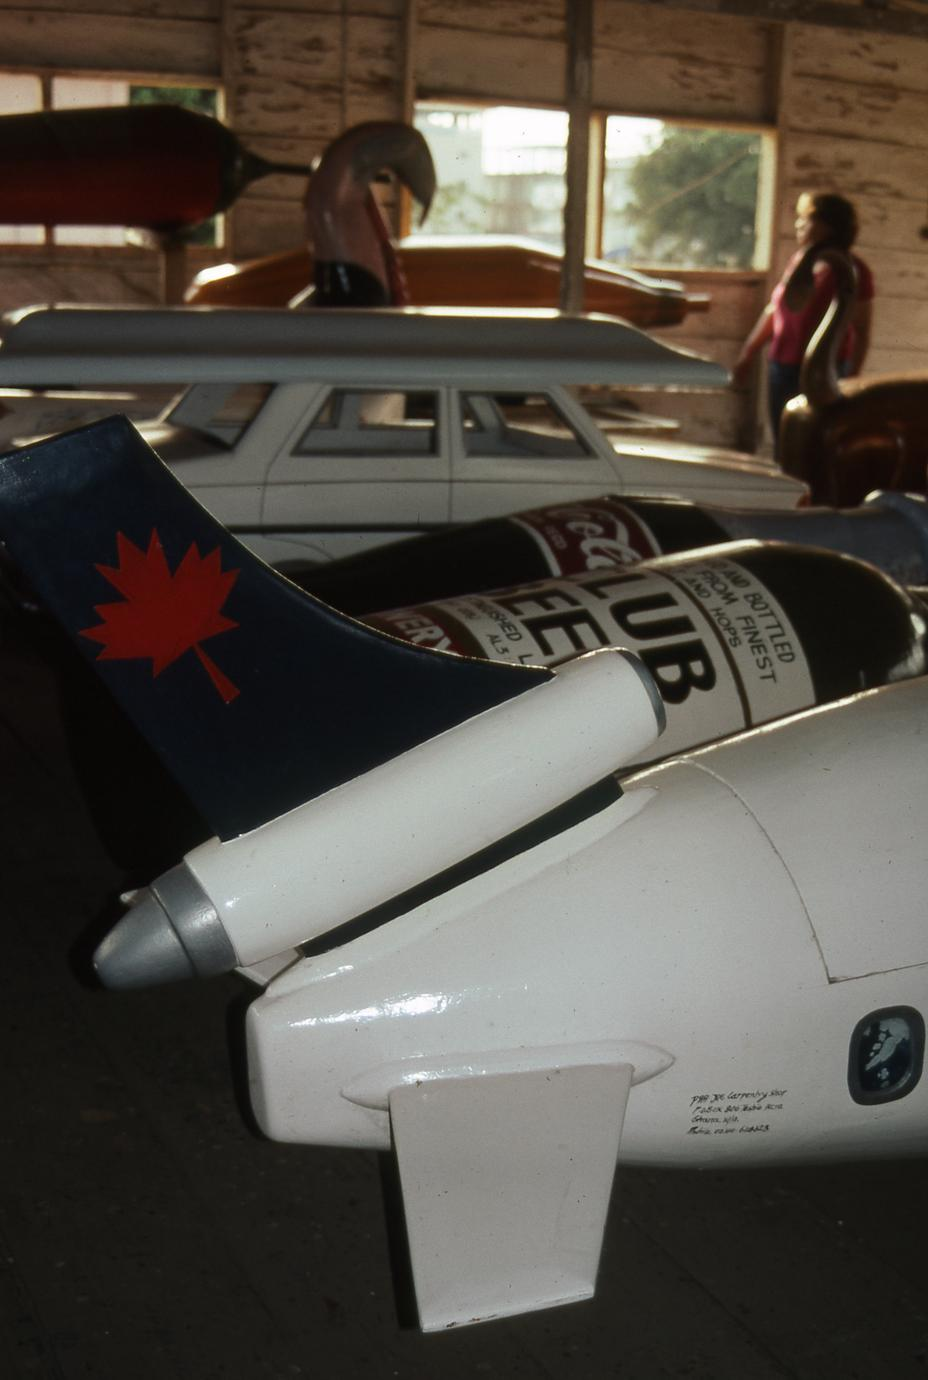 Plane and beverage replicas